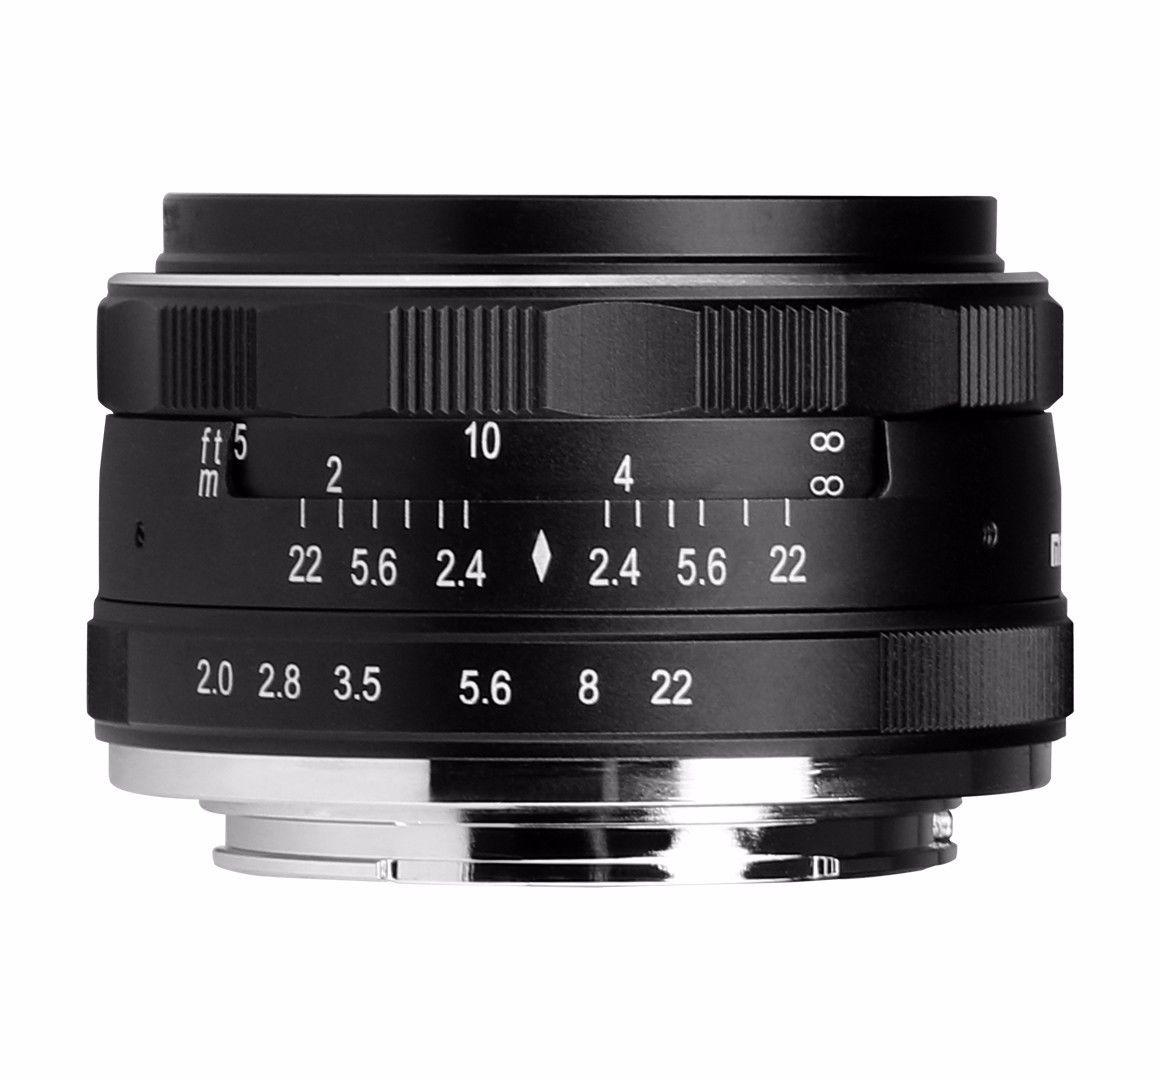 50mm F2.0 Aperture Manual Focus Lens APS-C for Canon EOSM M2 M3 camera 50mm f2 0 aperture manual focus lens aps c for eosm nikon1 m43 sony e mount nex3 5t 6 7 a5000 a6000 a6300 fuji xt1 camera